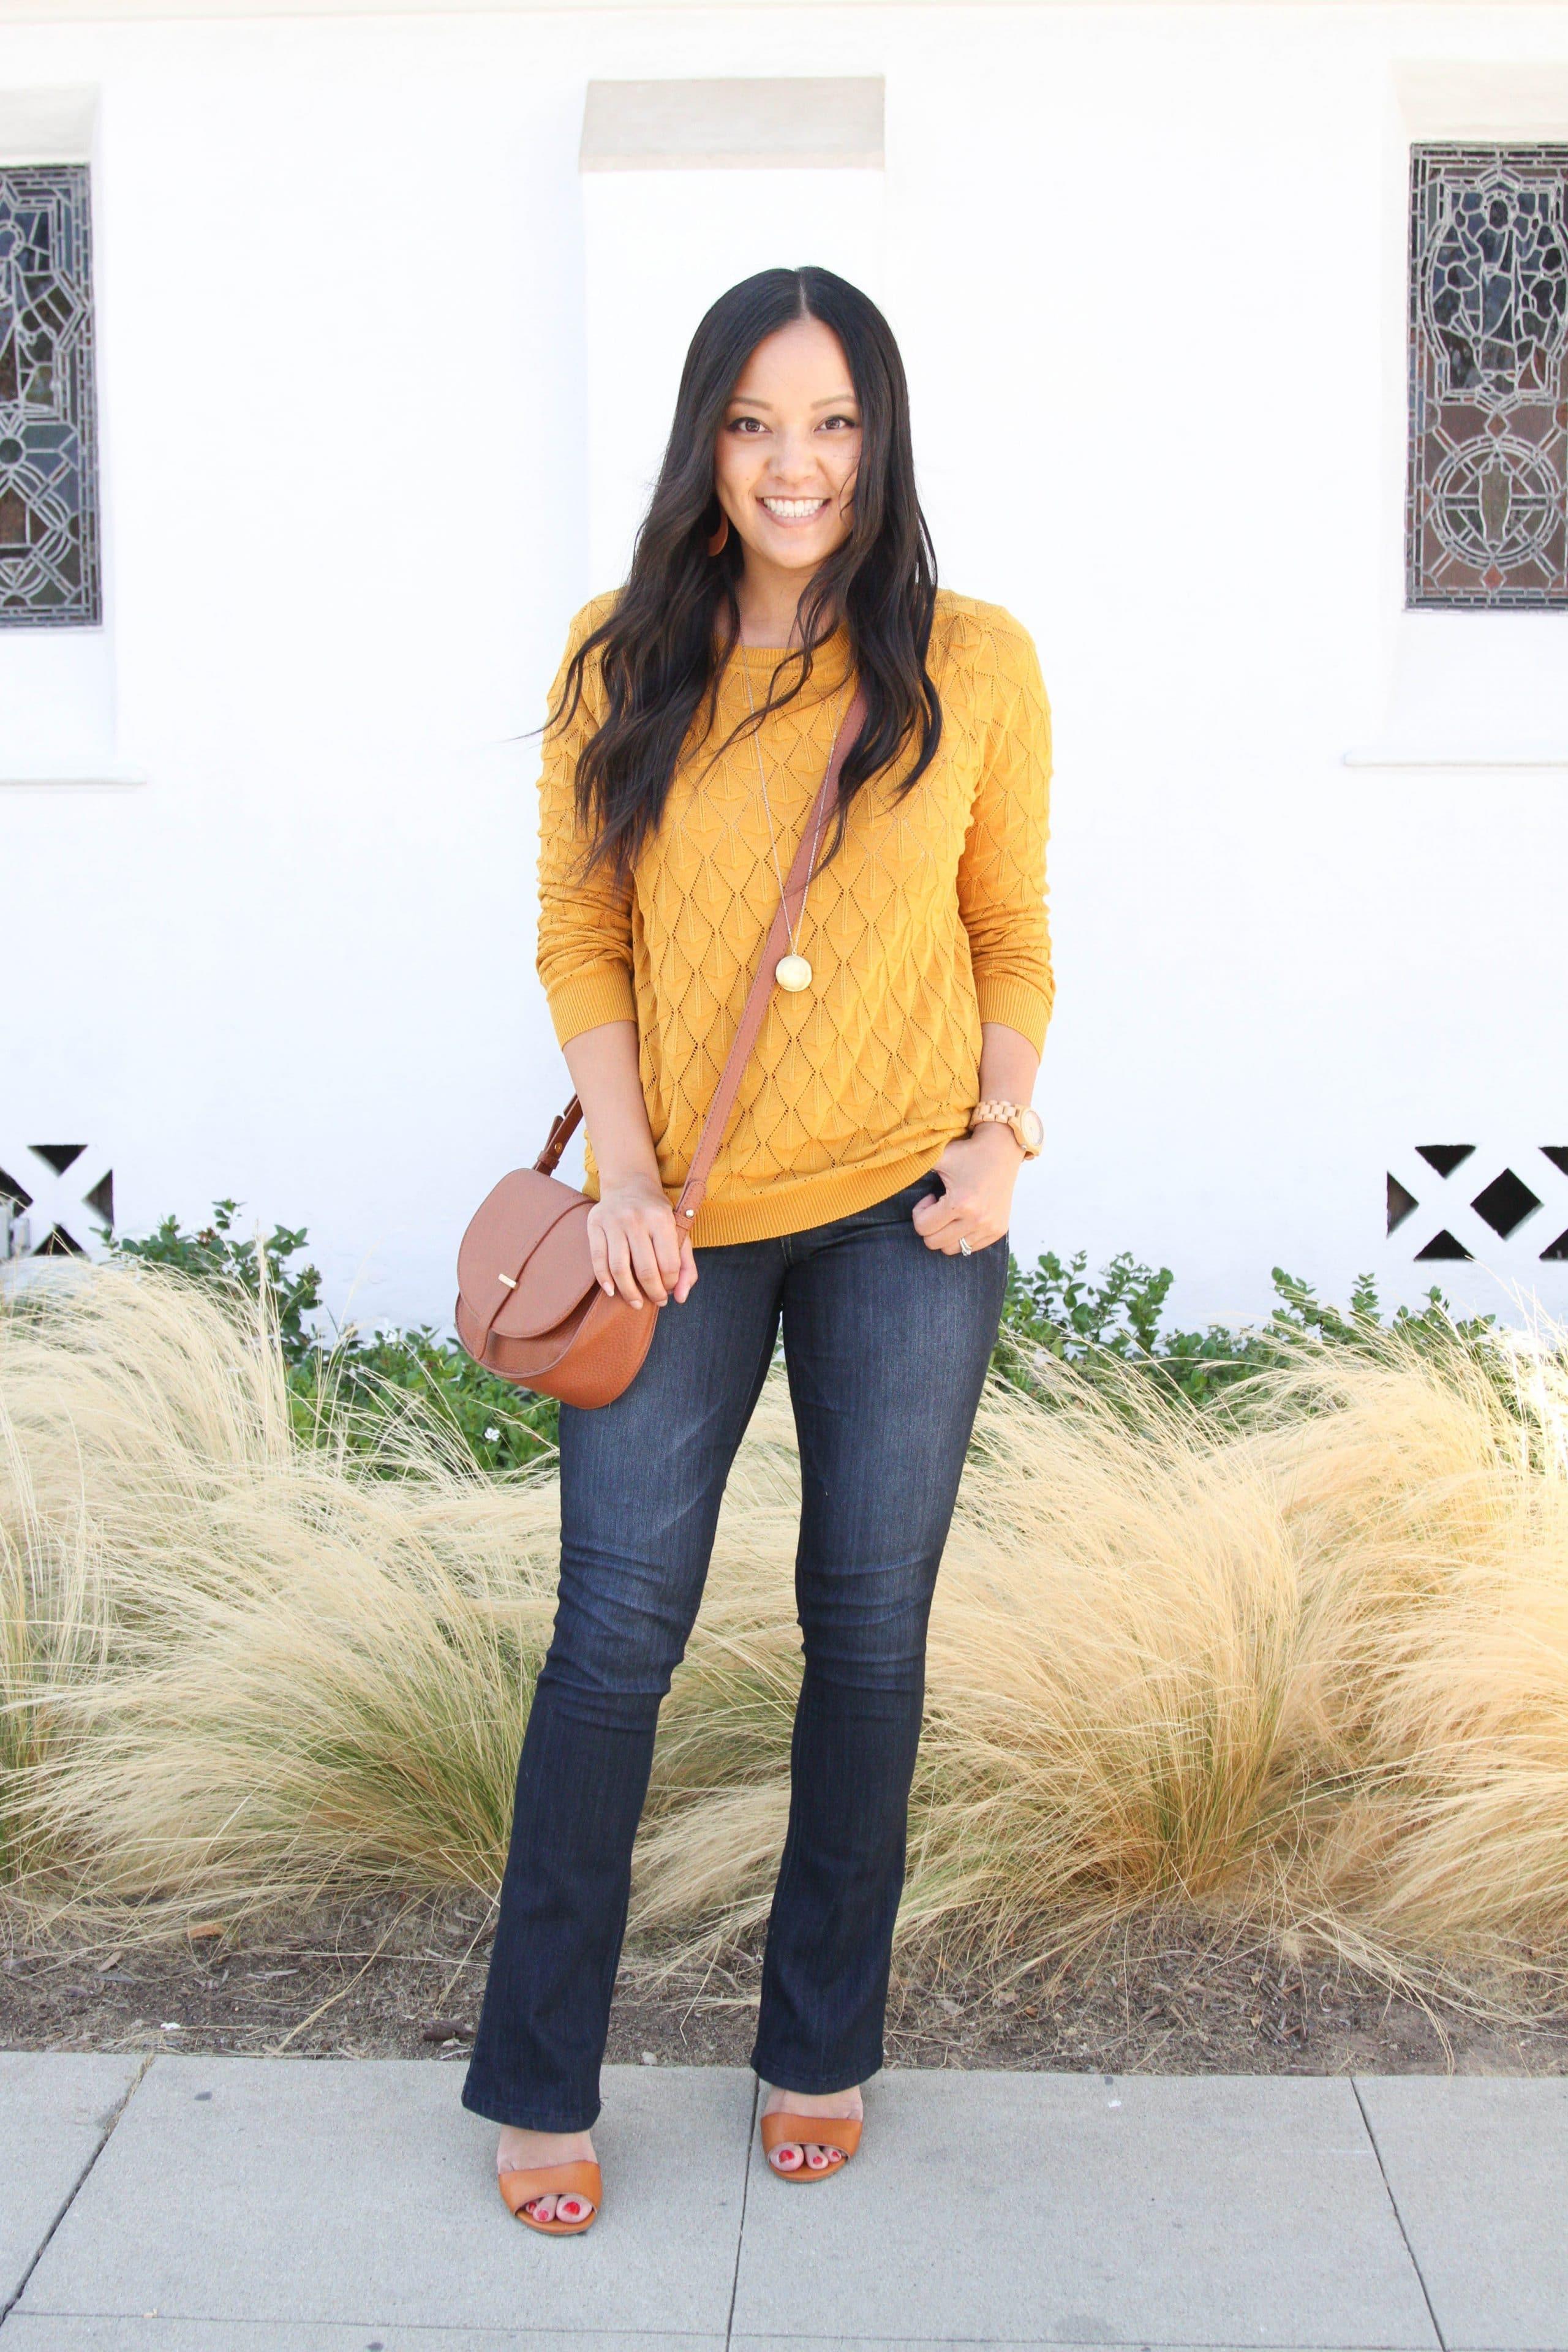 Mustard Sweater + Bootcut Jeans + Heels + Cognac Bag